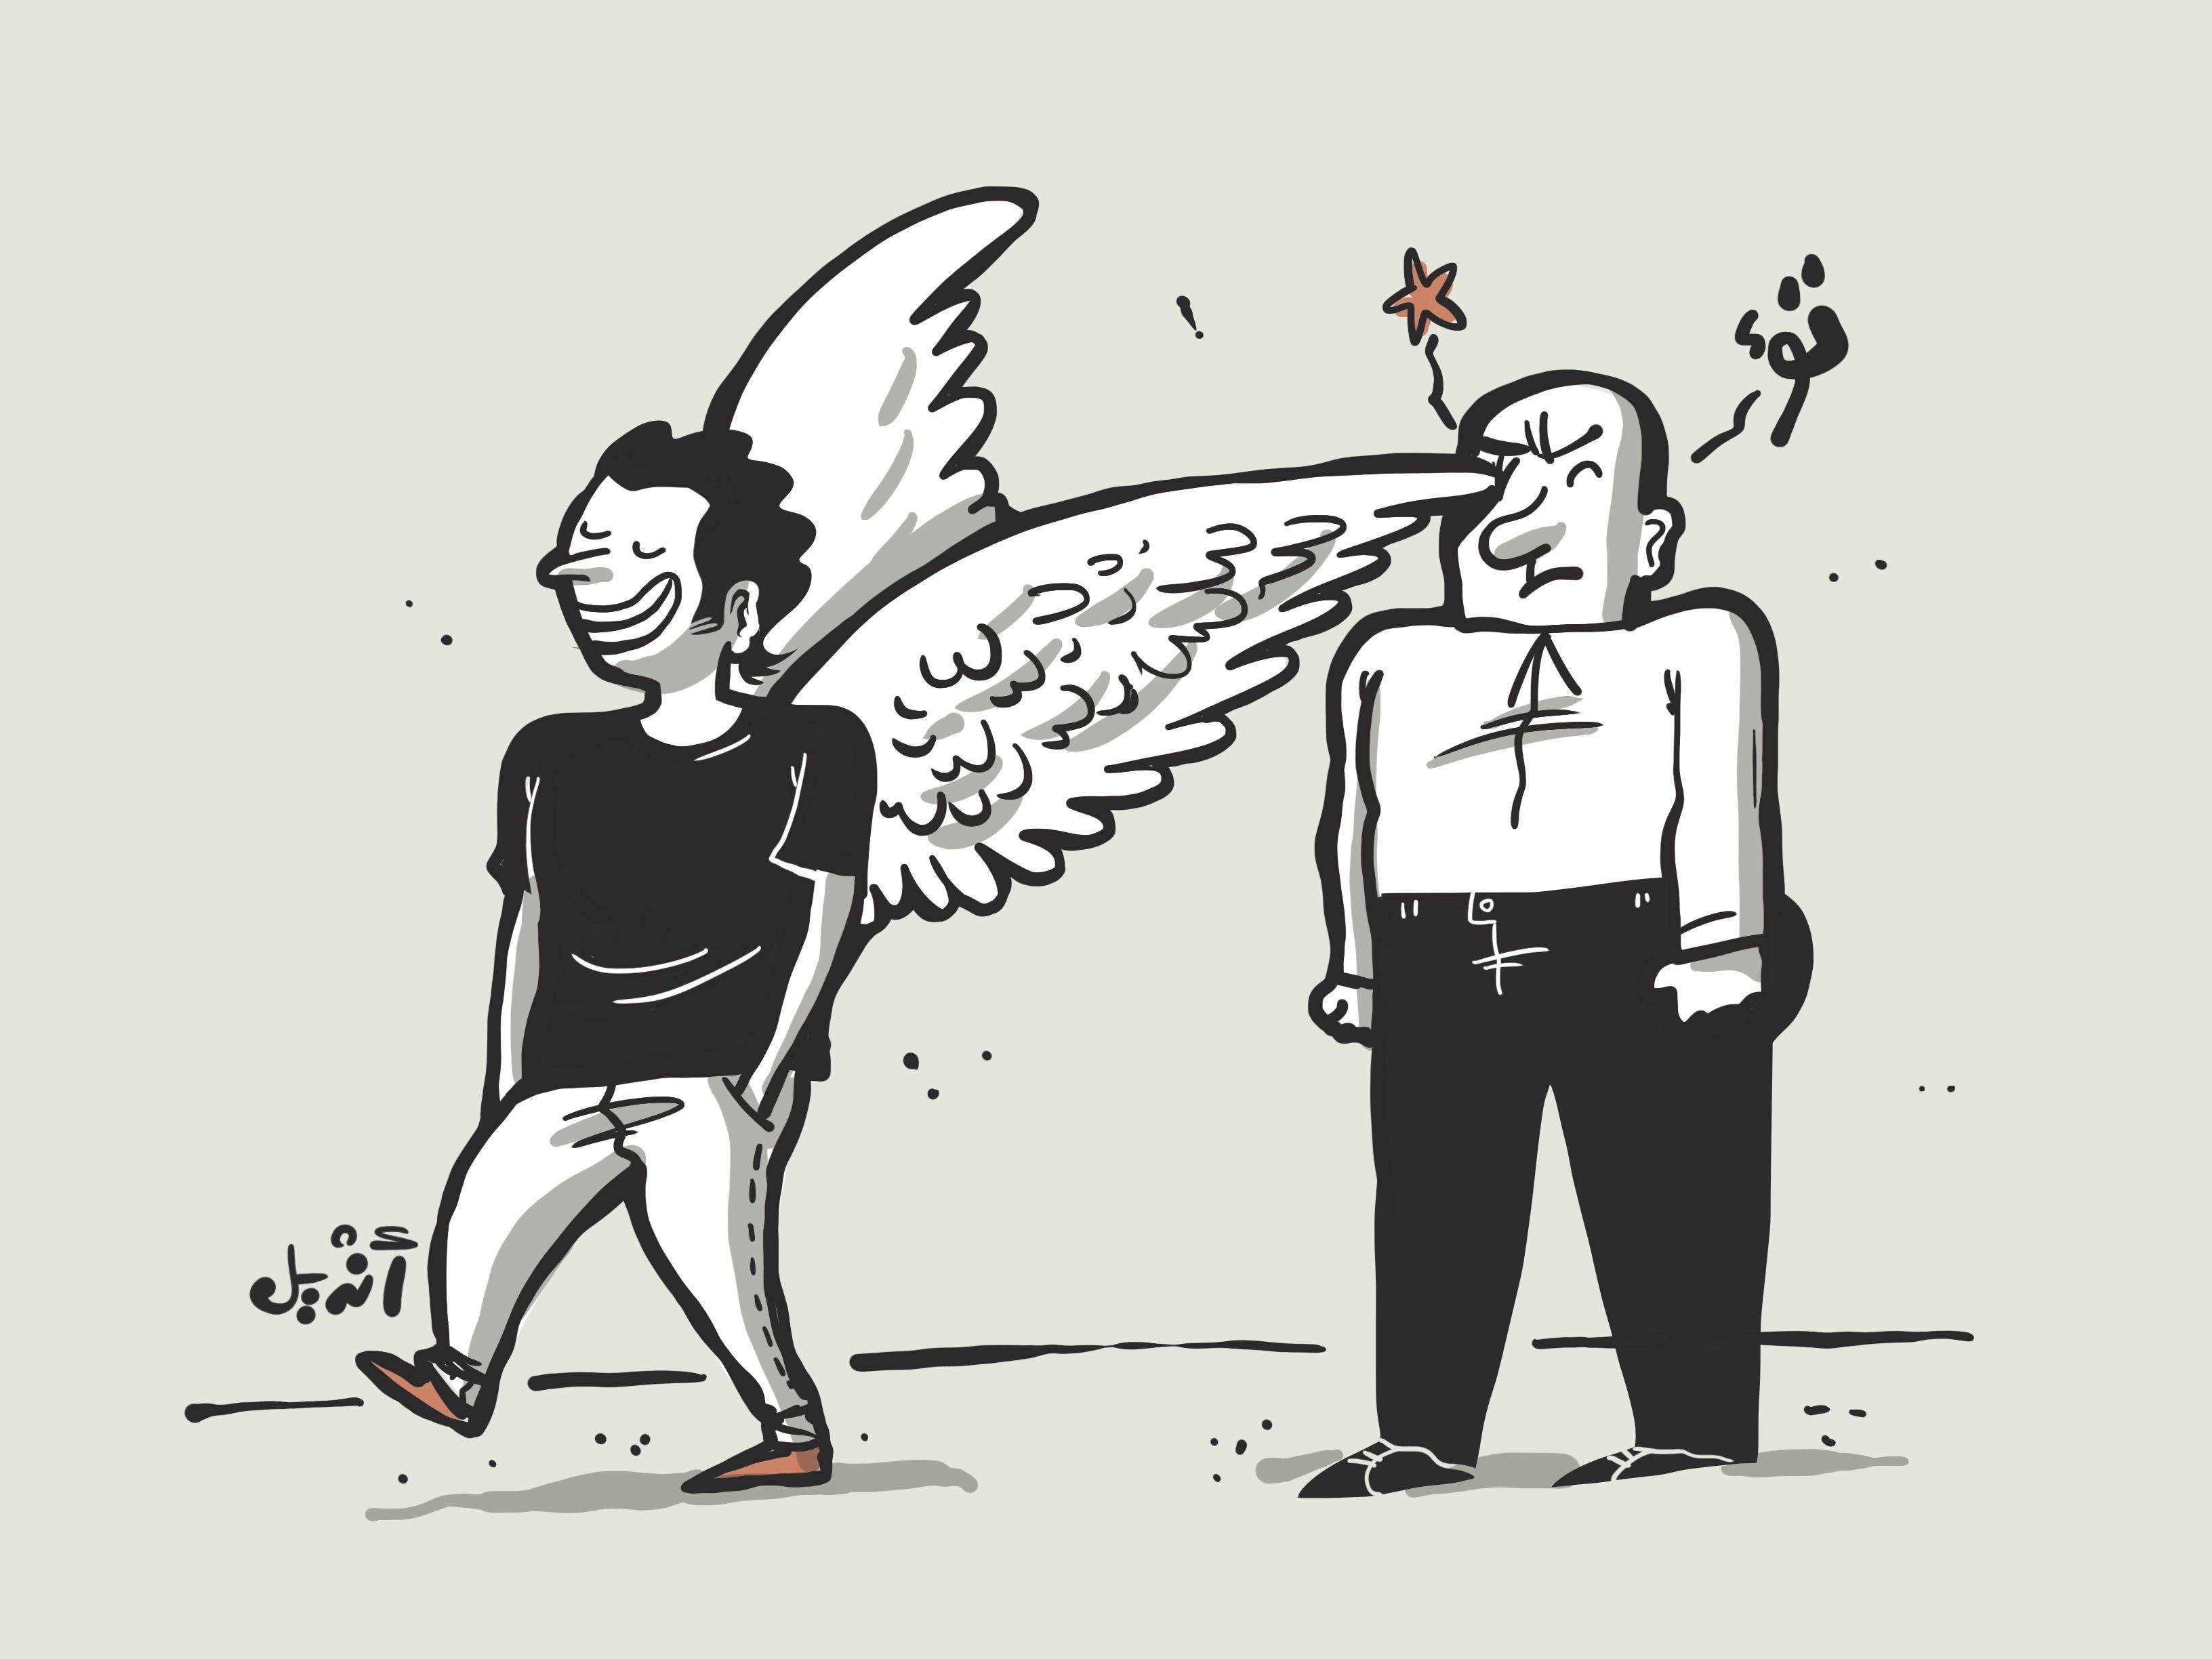 Cartoon: A man walks into a wing